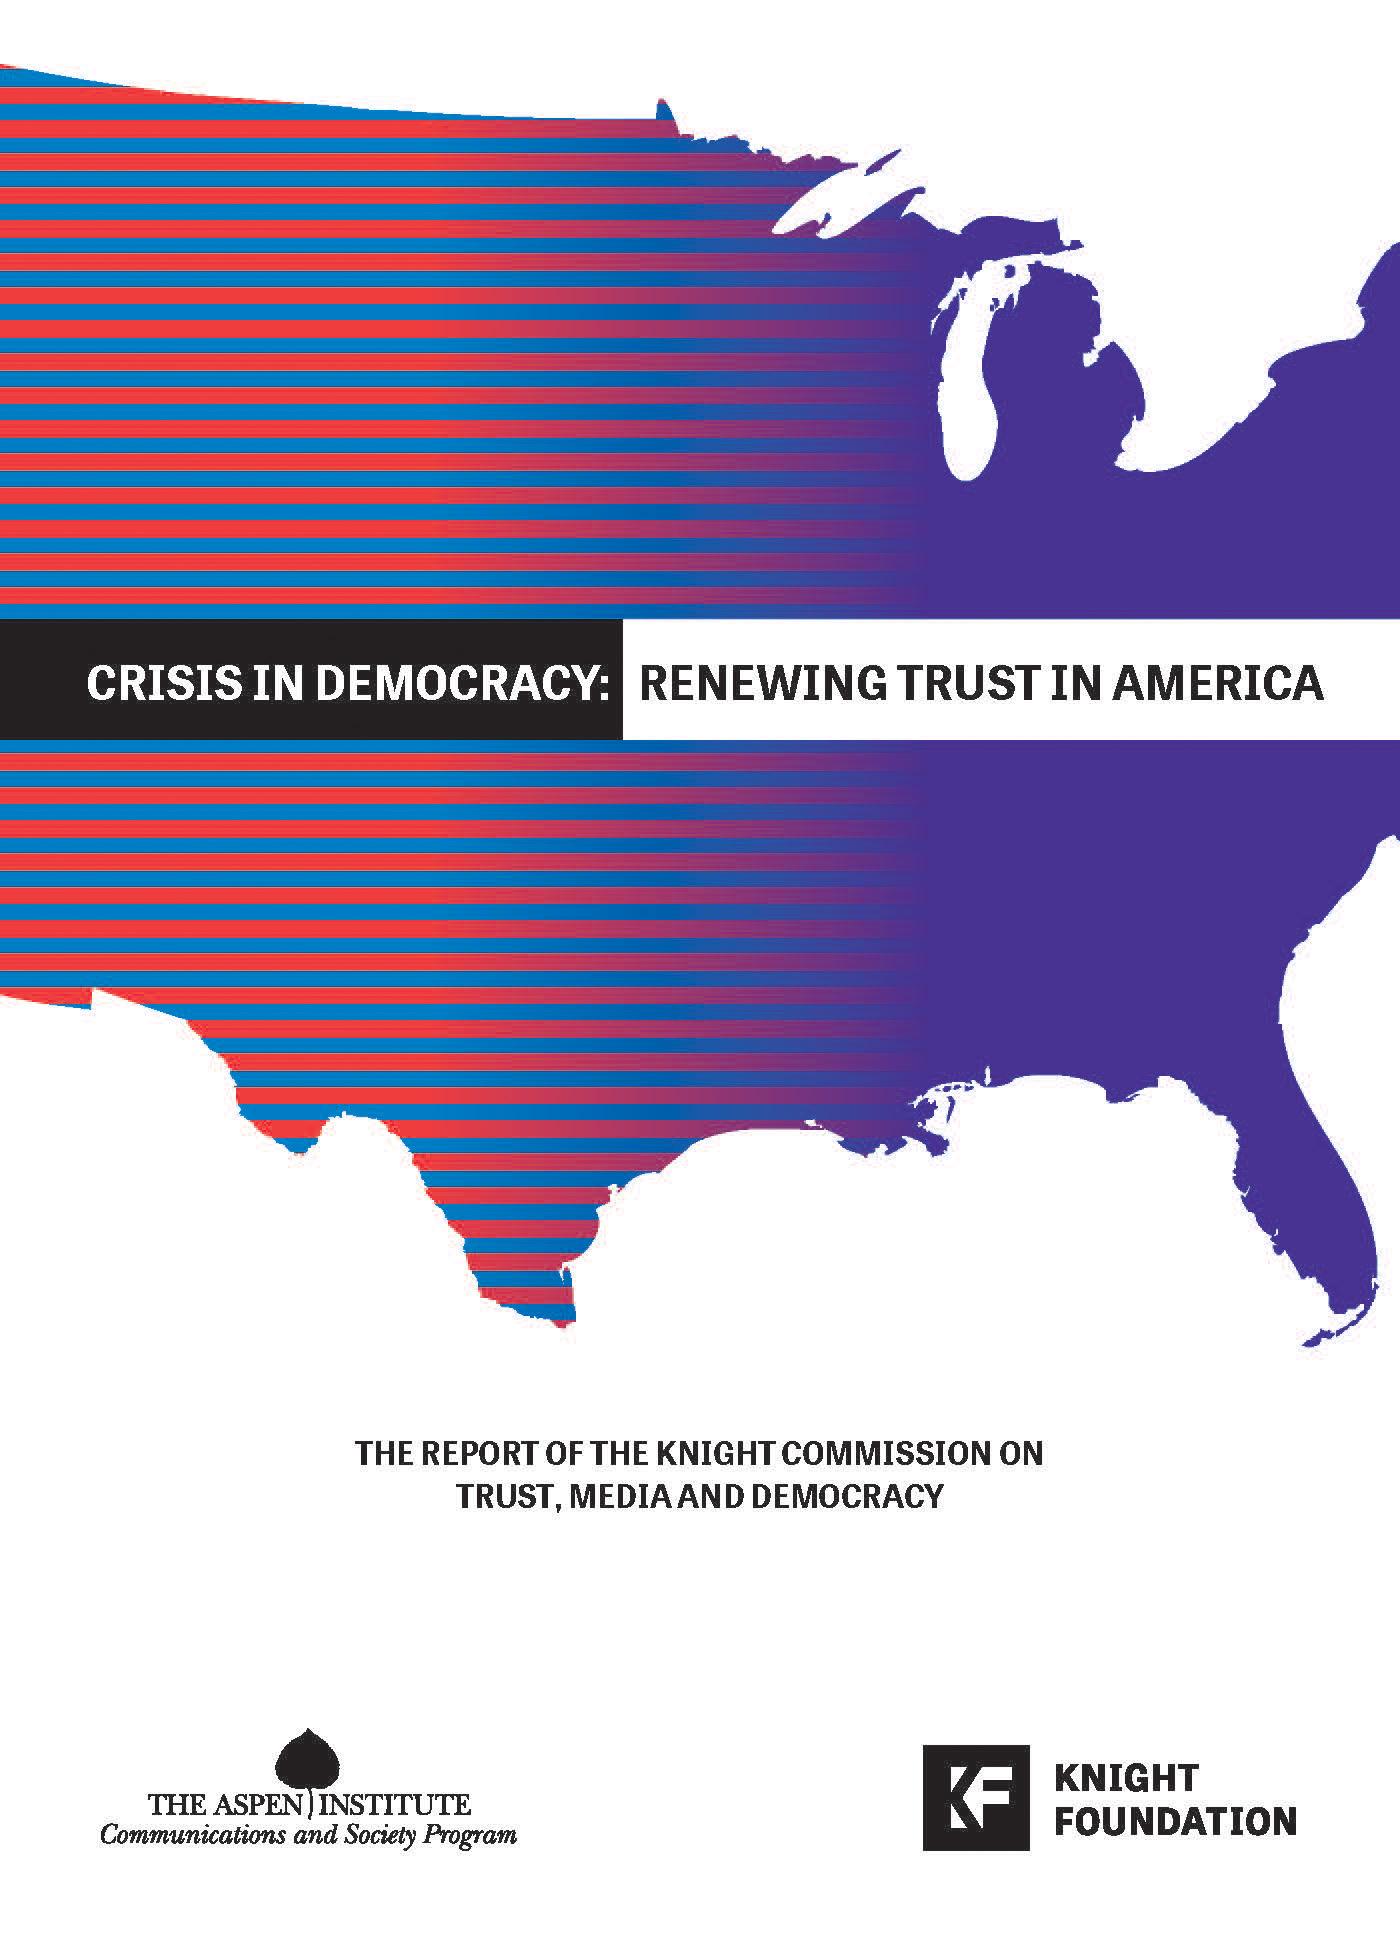 Crisis in Democracy: Executive Summary